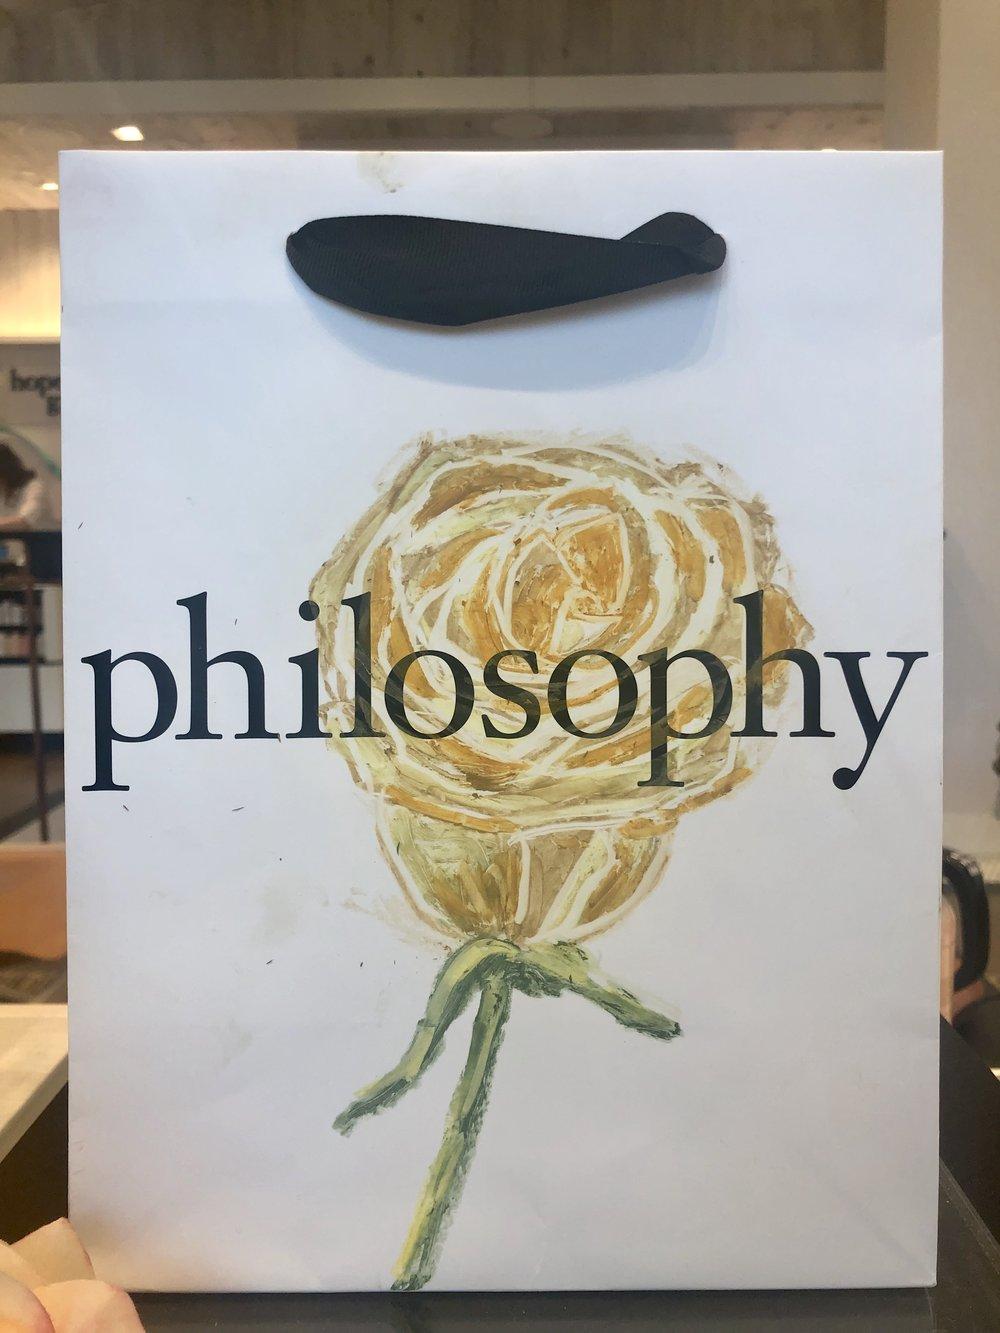 katrina-eugenia-philosophy-skincare-love-philosophy-amazing-grace-amazing-grace-ballet-rose-live-painting-oil-painting25.jpg